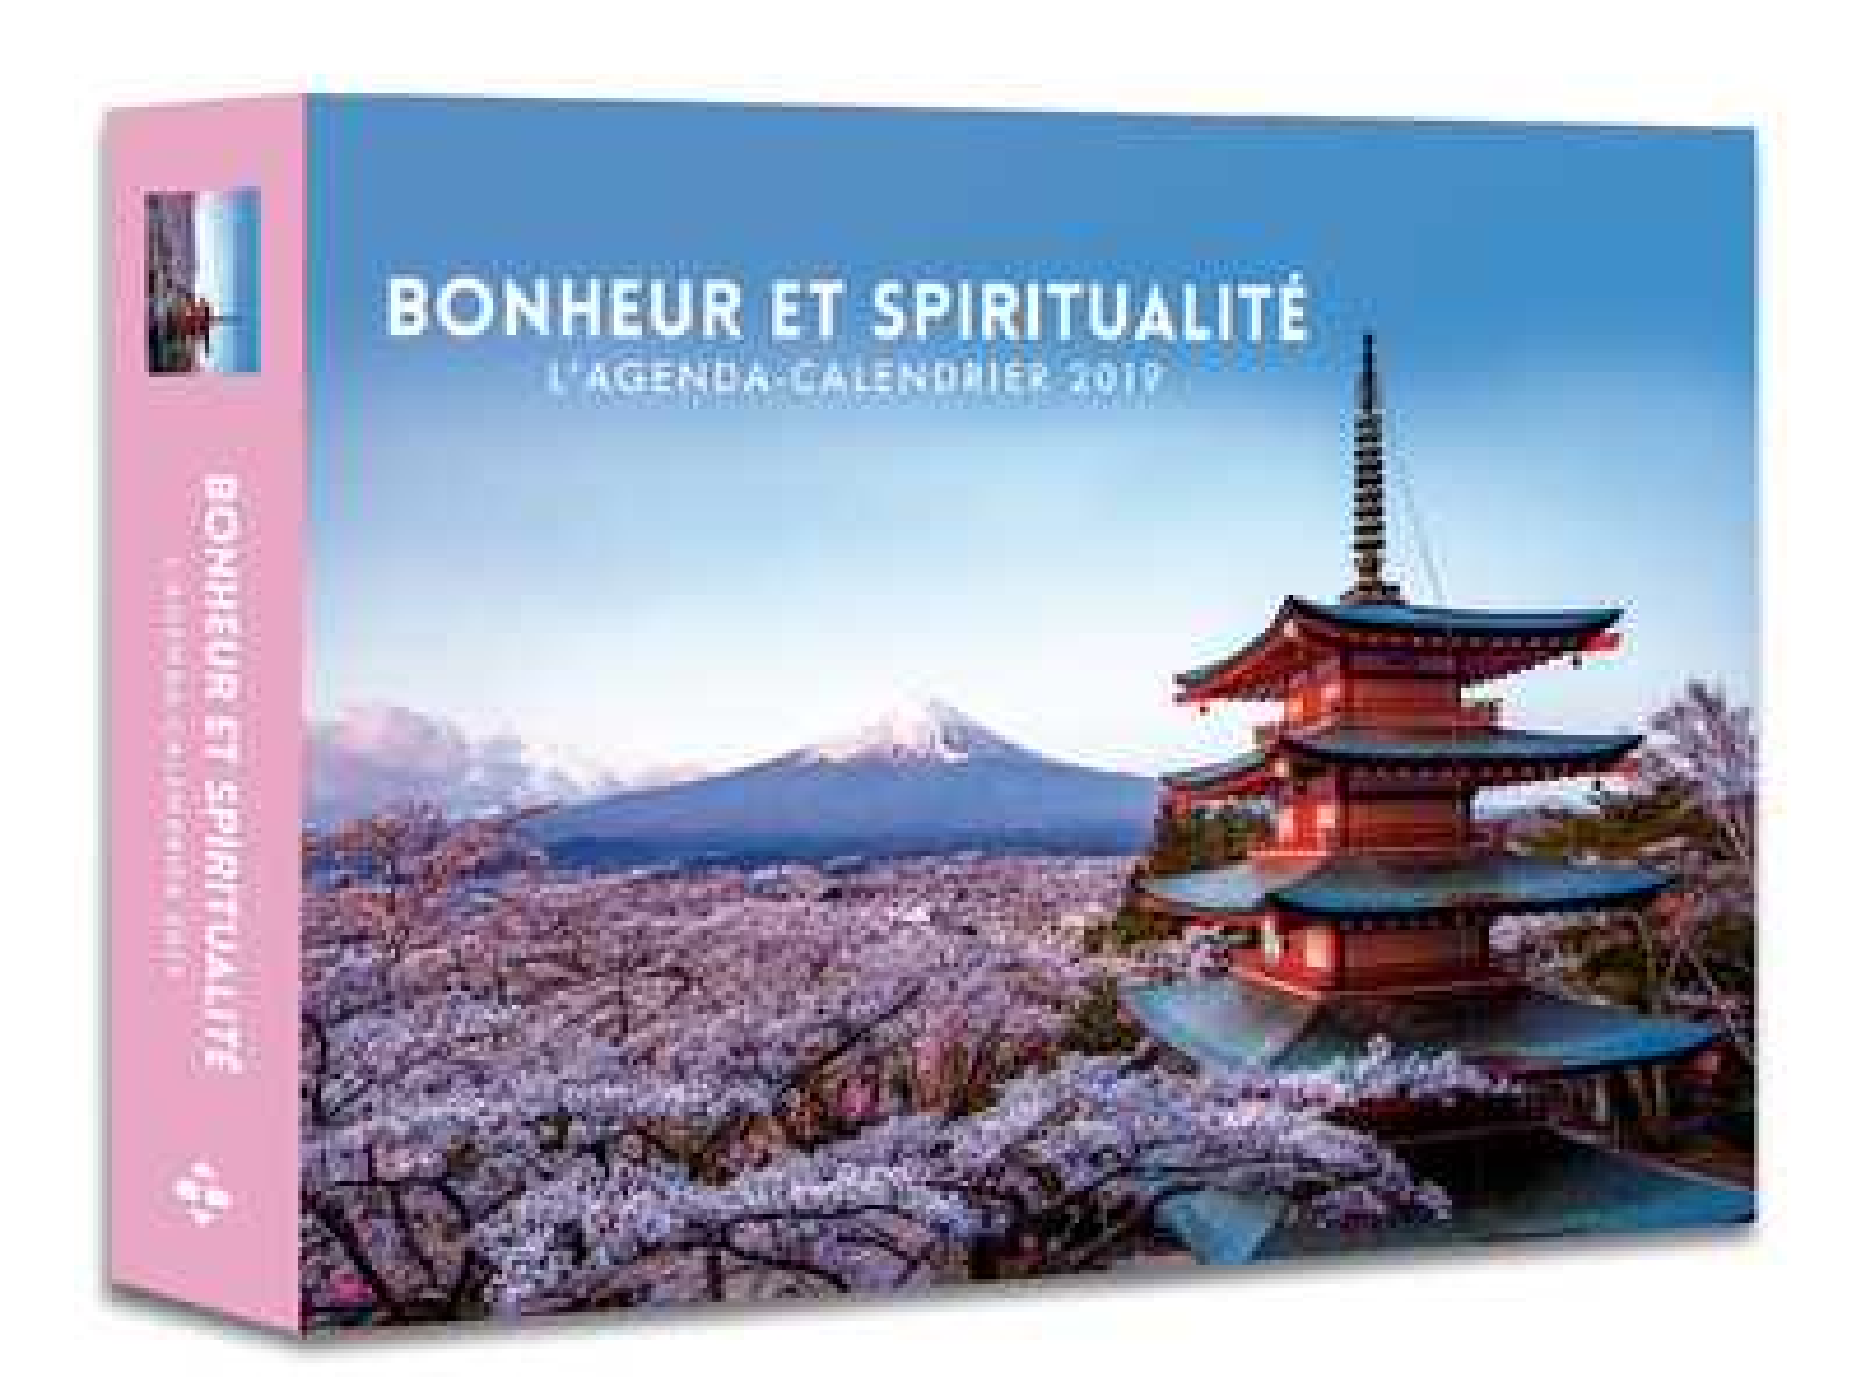 L'AGENDA-CALENDRIER BONHEUR ET SPIRITUALITE 2019